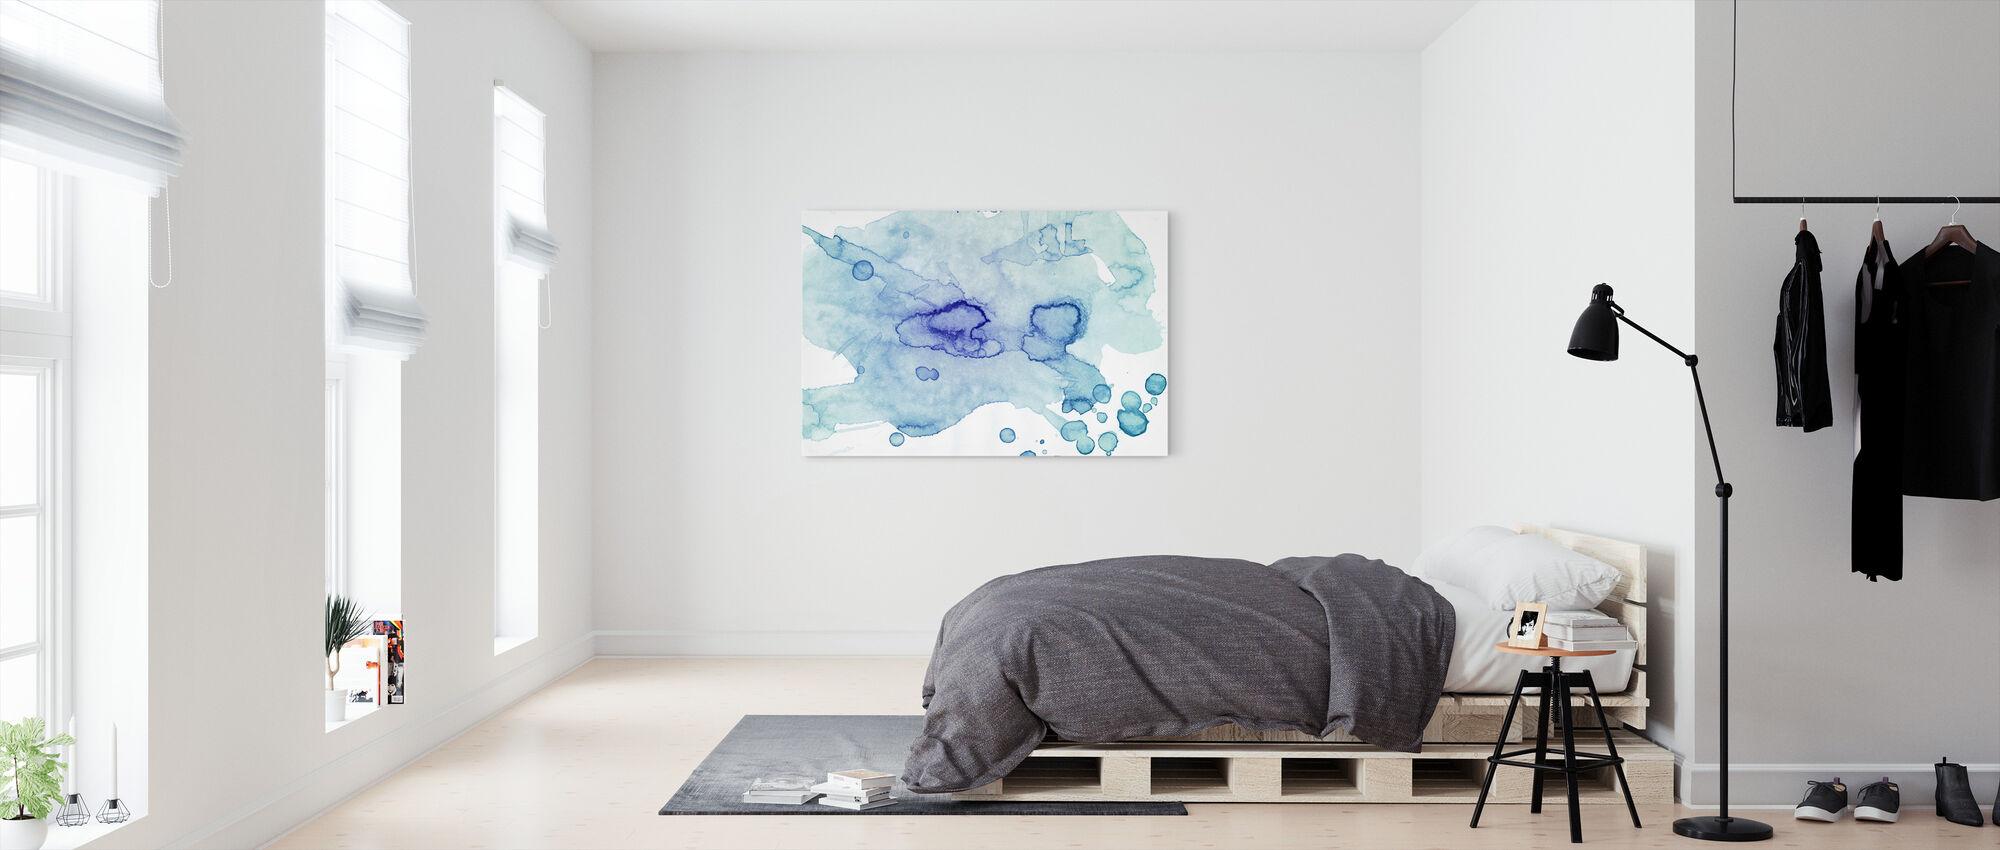 Colour Puddle - Canvas print - Bedroom